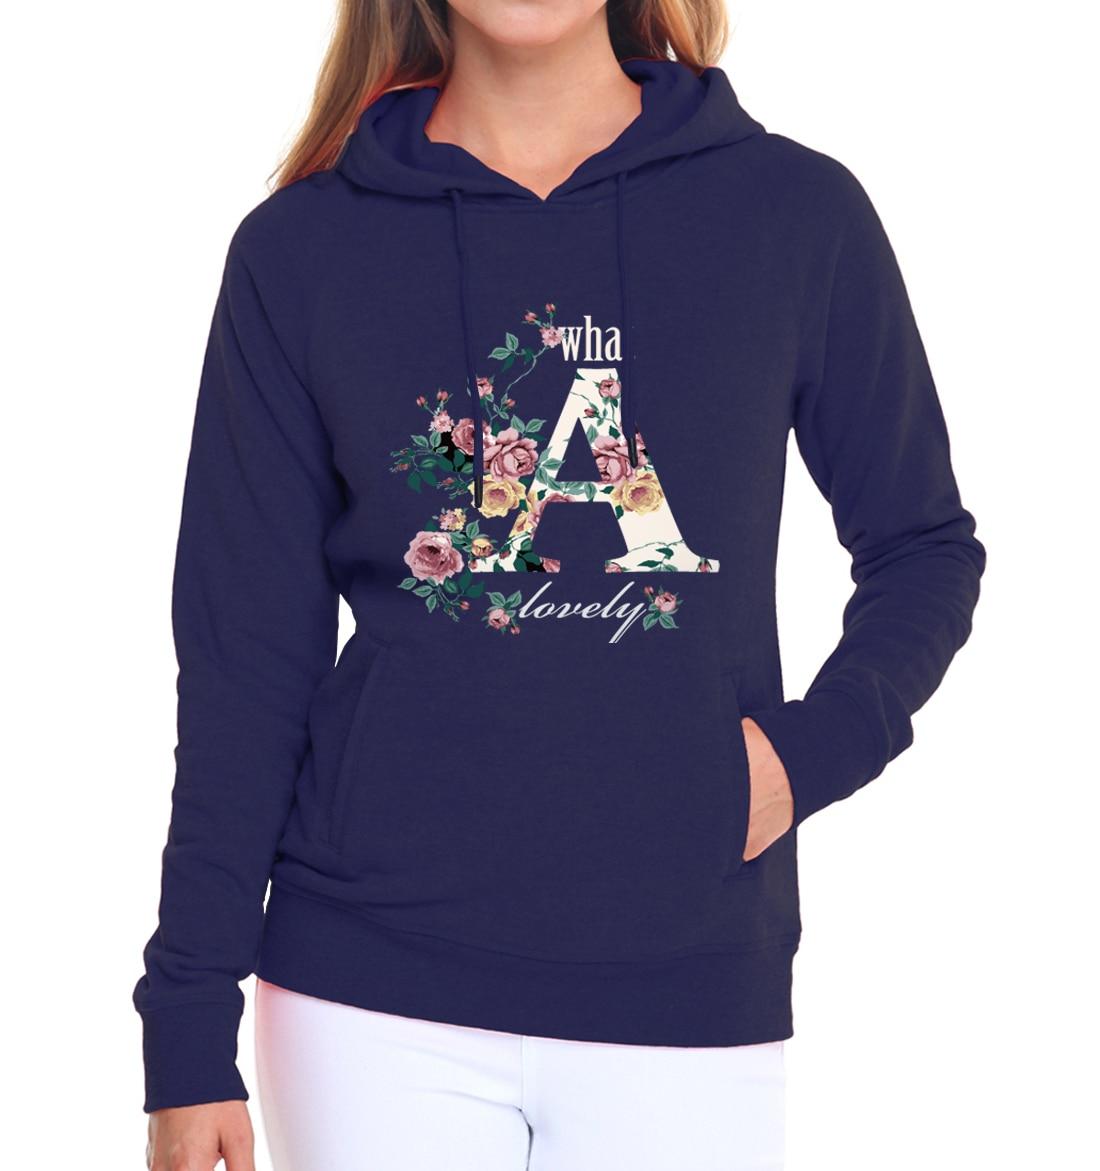 2019 autumn winter flower rose hoodies women hipster true love long sleeve sweatshirts casual fleece kpop tracksuits pink hooded